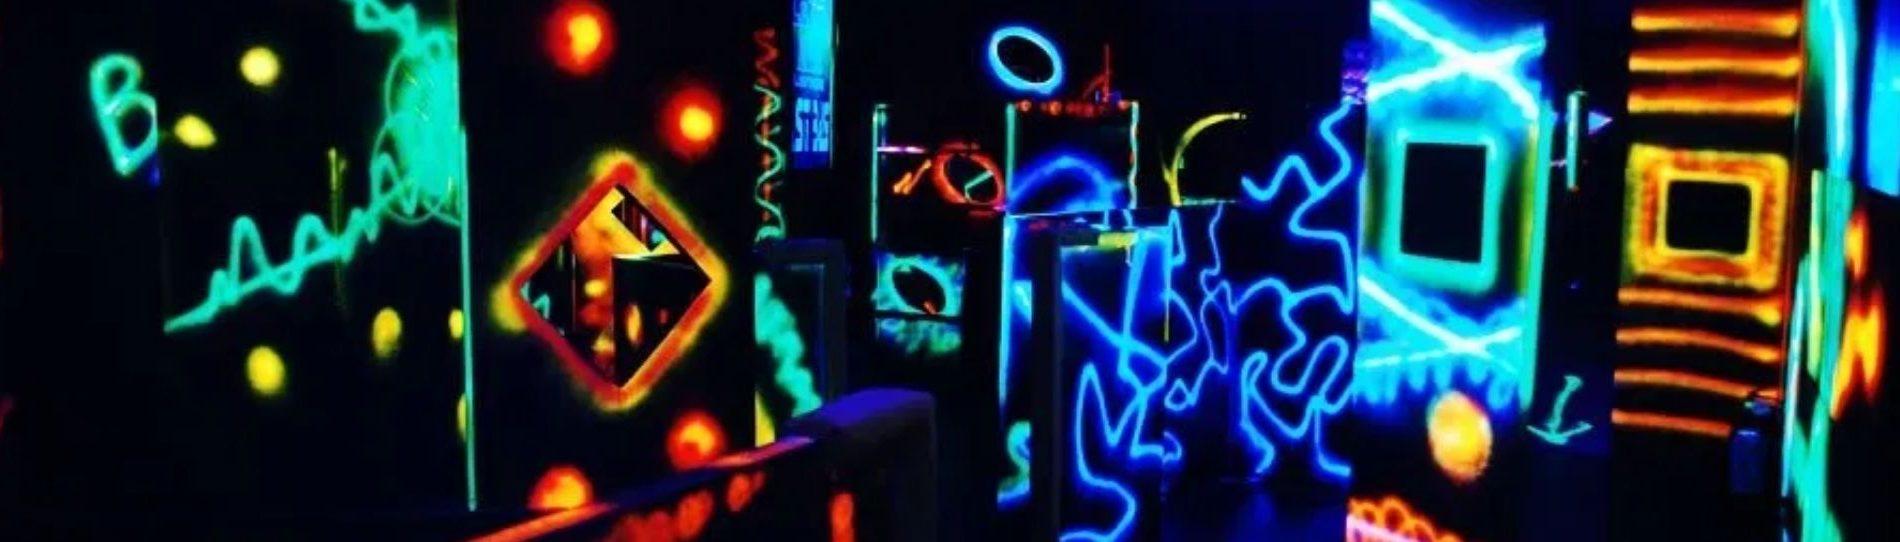 tauranga bucks laser tag